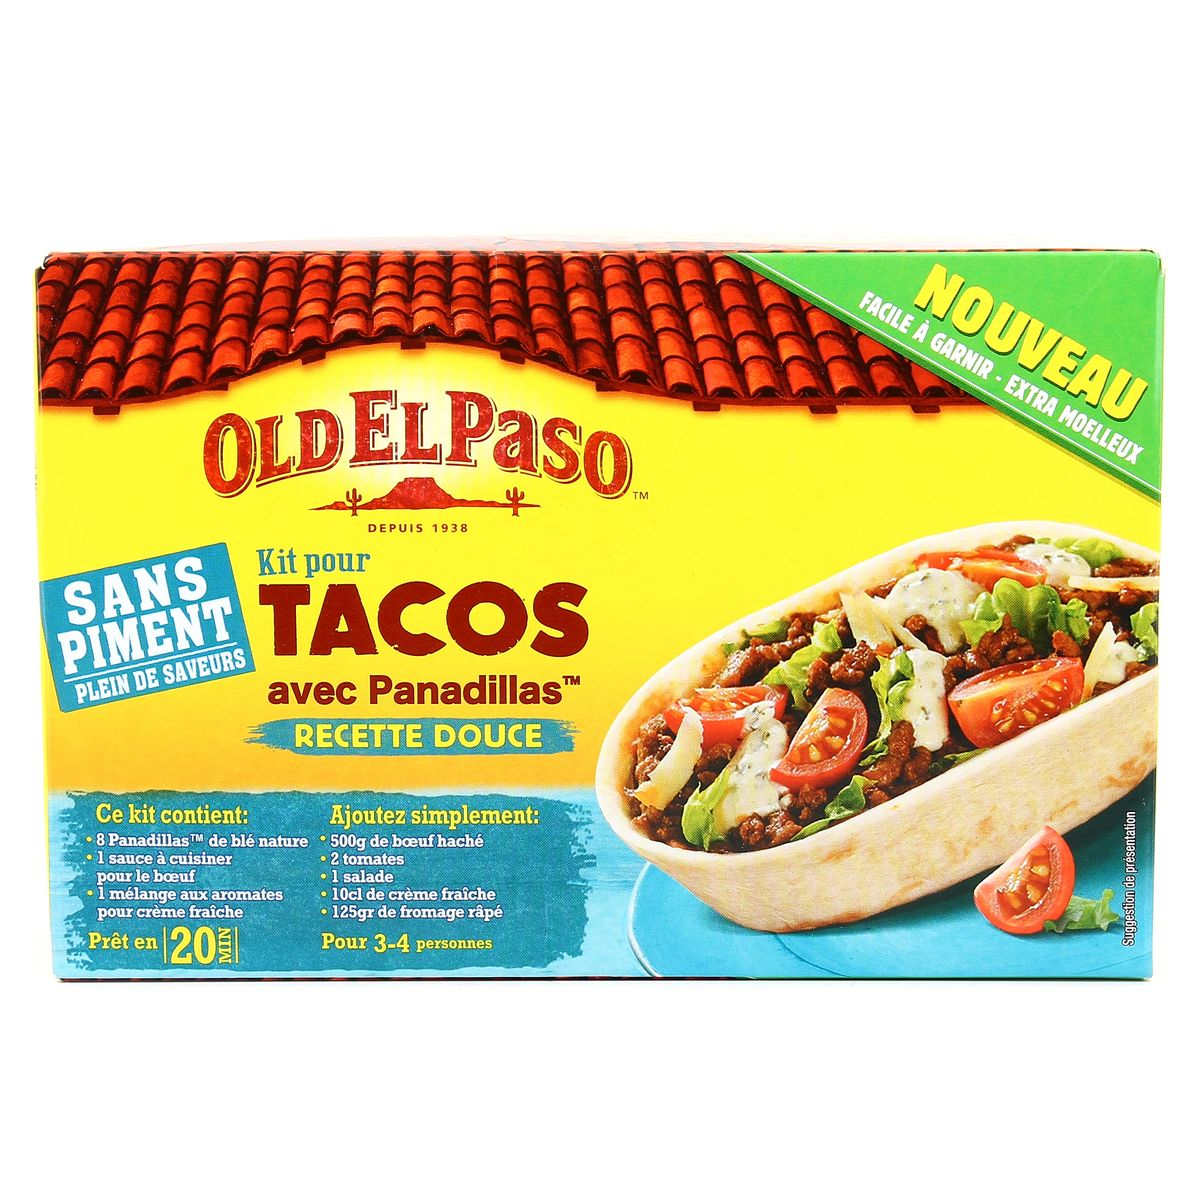 old el paso kit pour tacos avec panadillas 329g. Black Bedroom Furniture Sets. Home Design Ideas